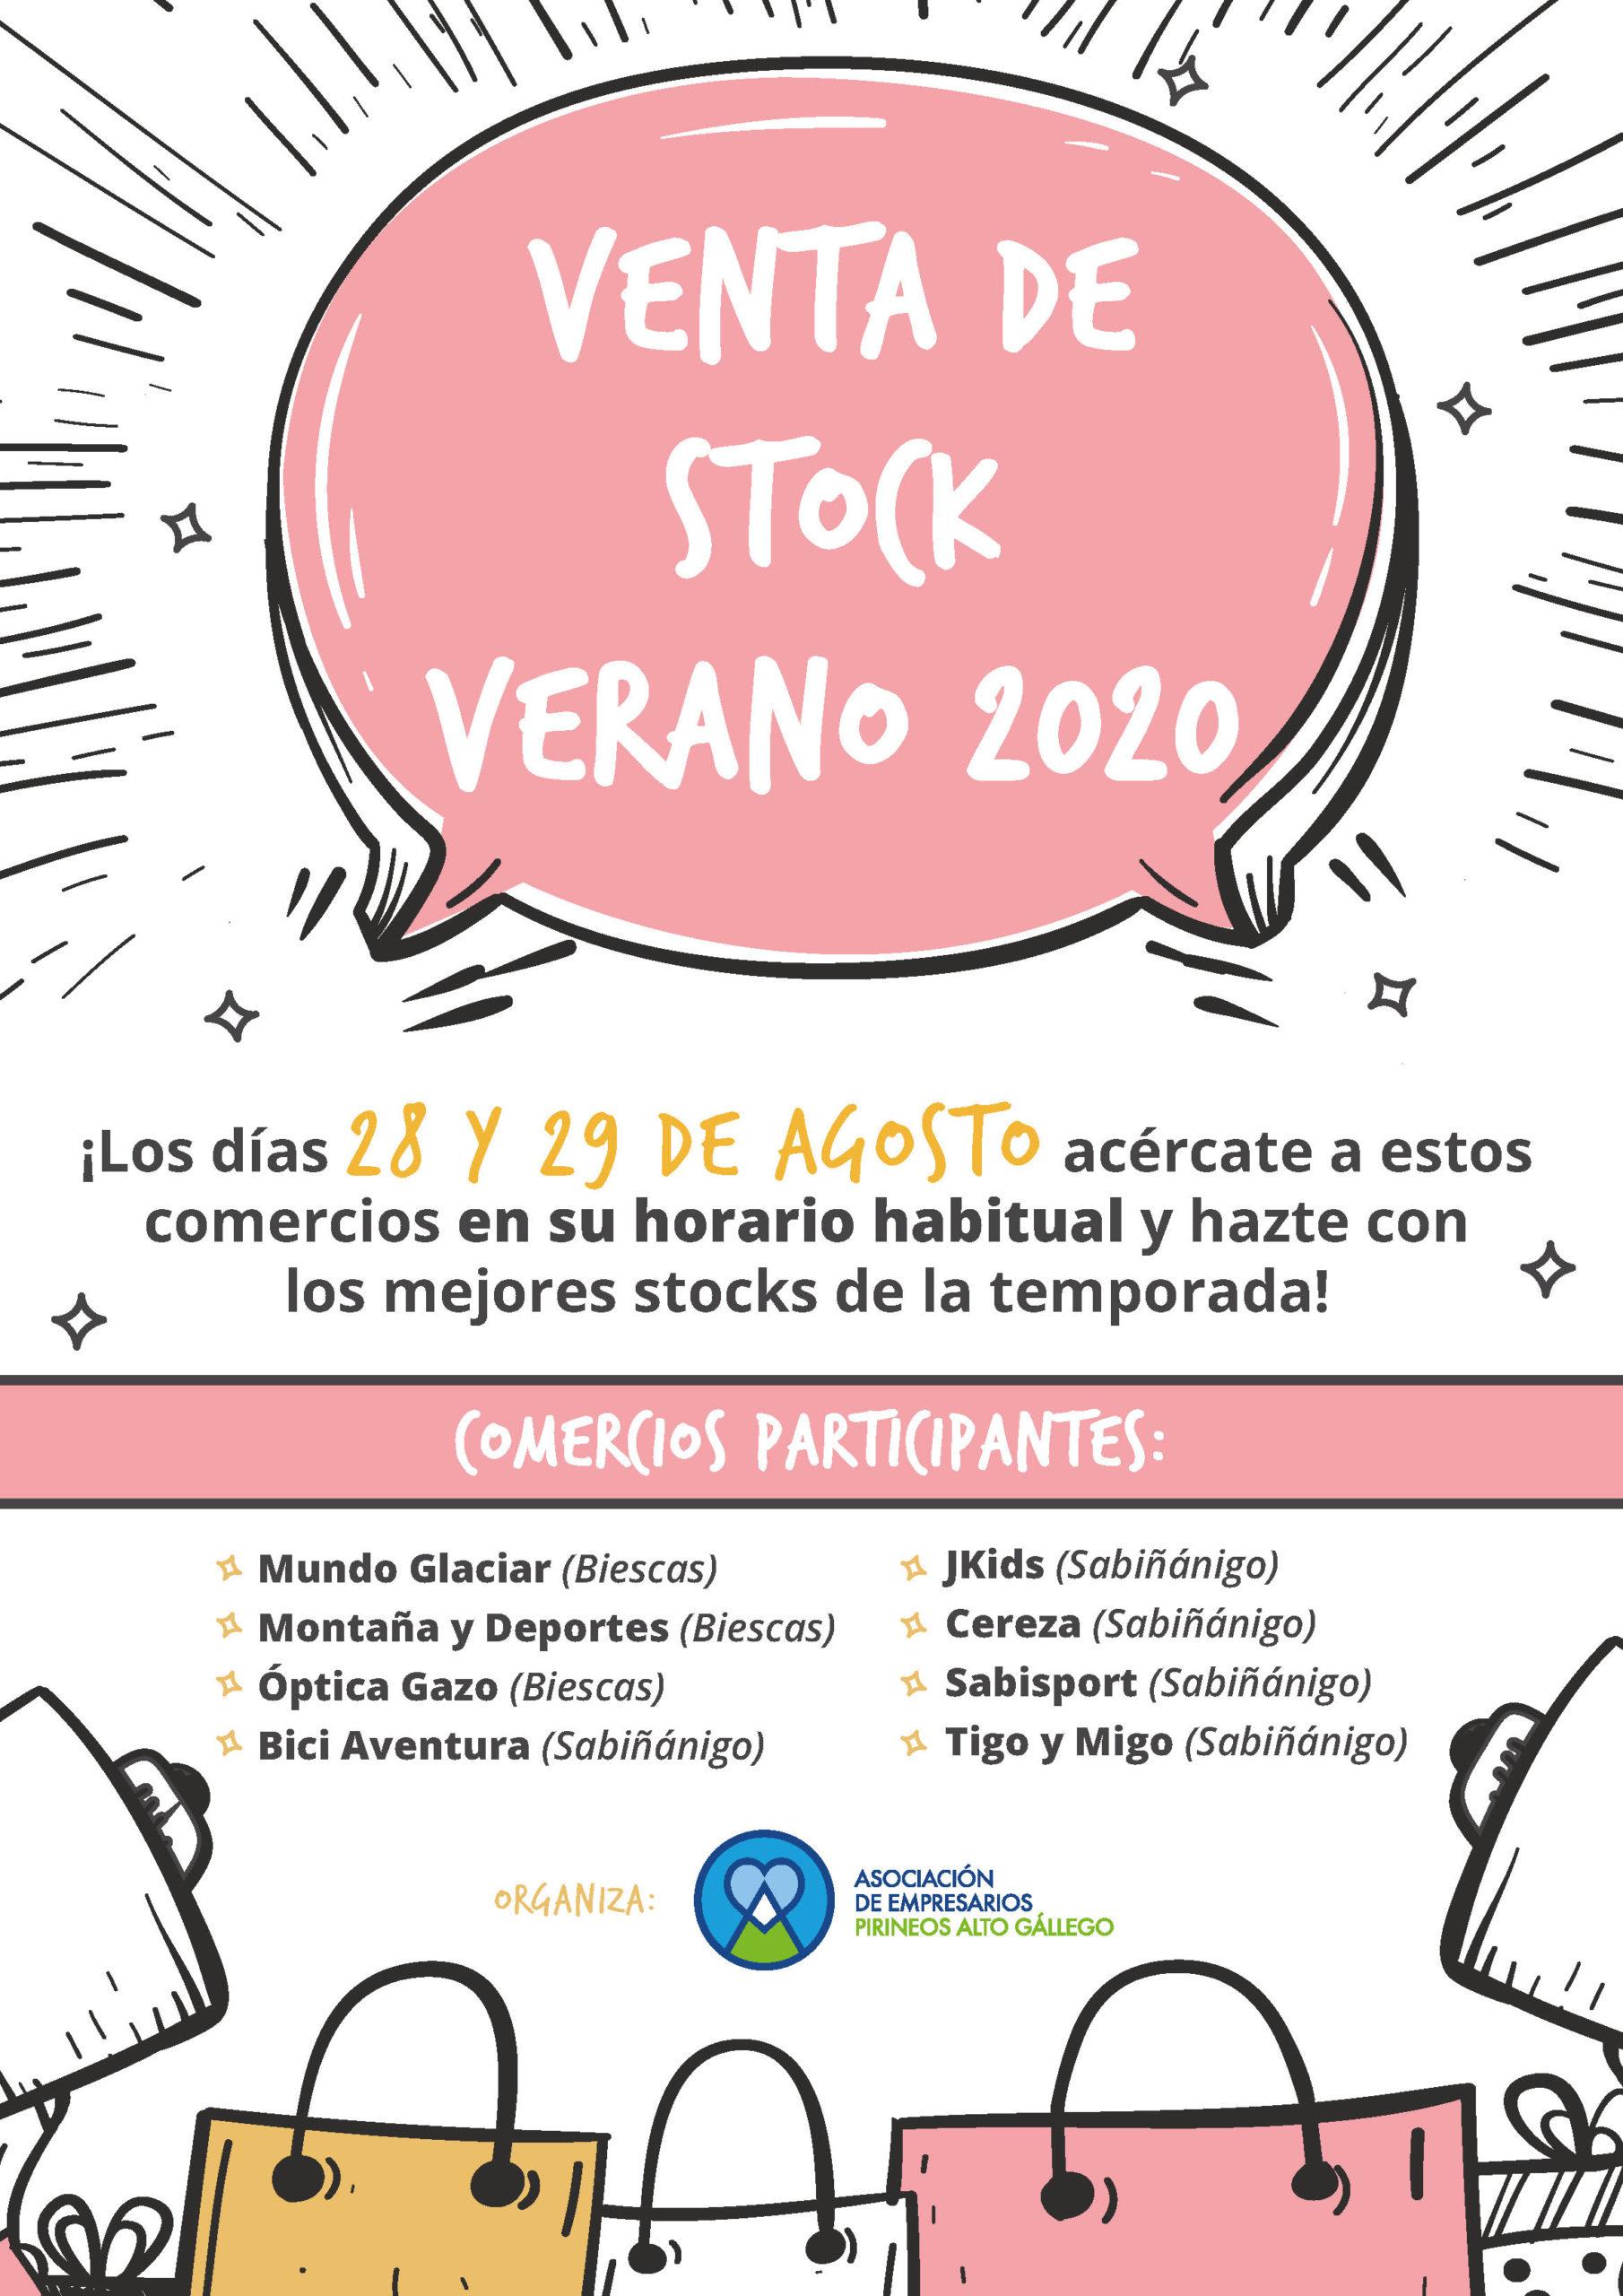 VENTA DE STOCK VERANO 2020